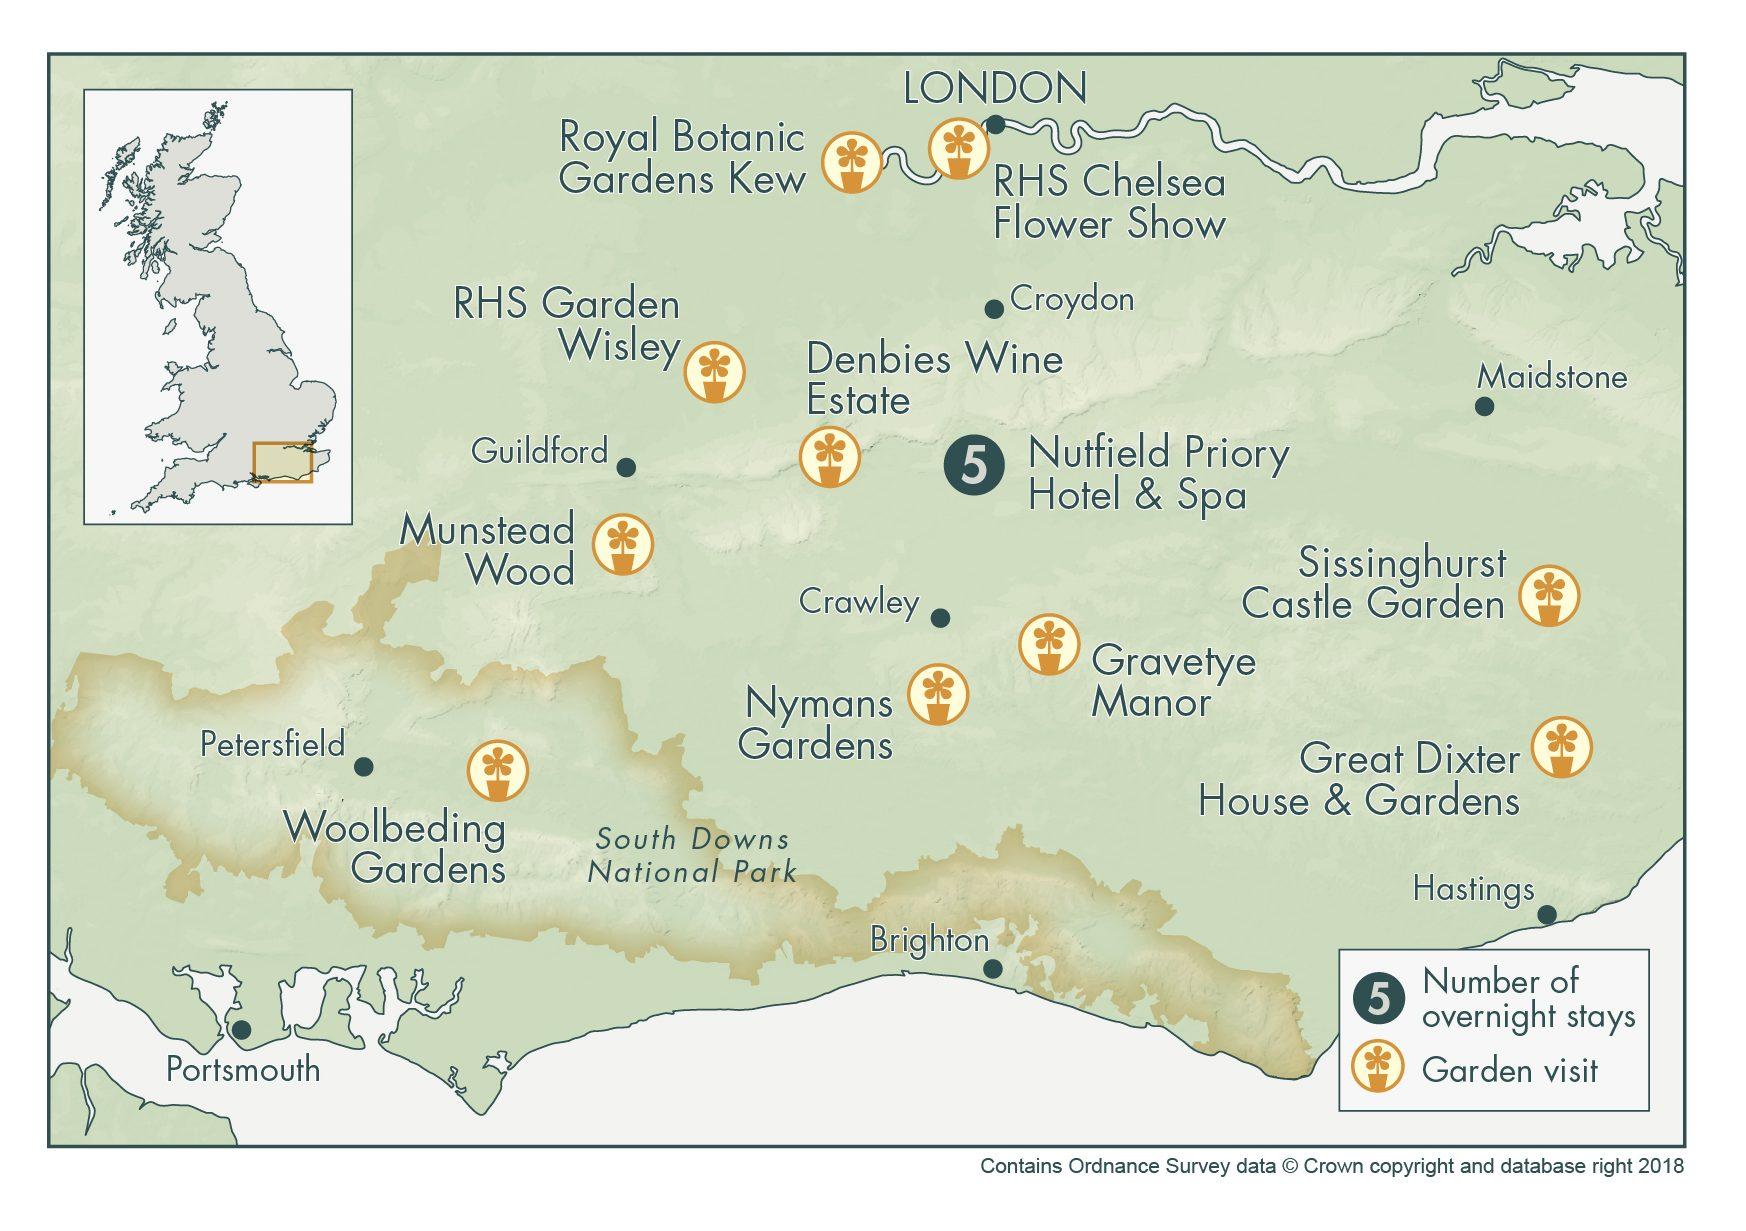 RHS Chelsea Flower Show & Iconic English Gardens